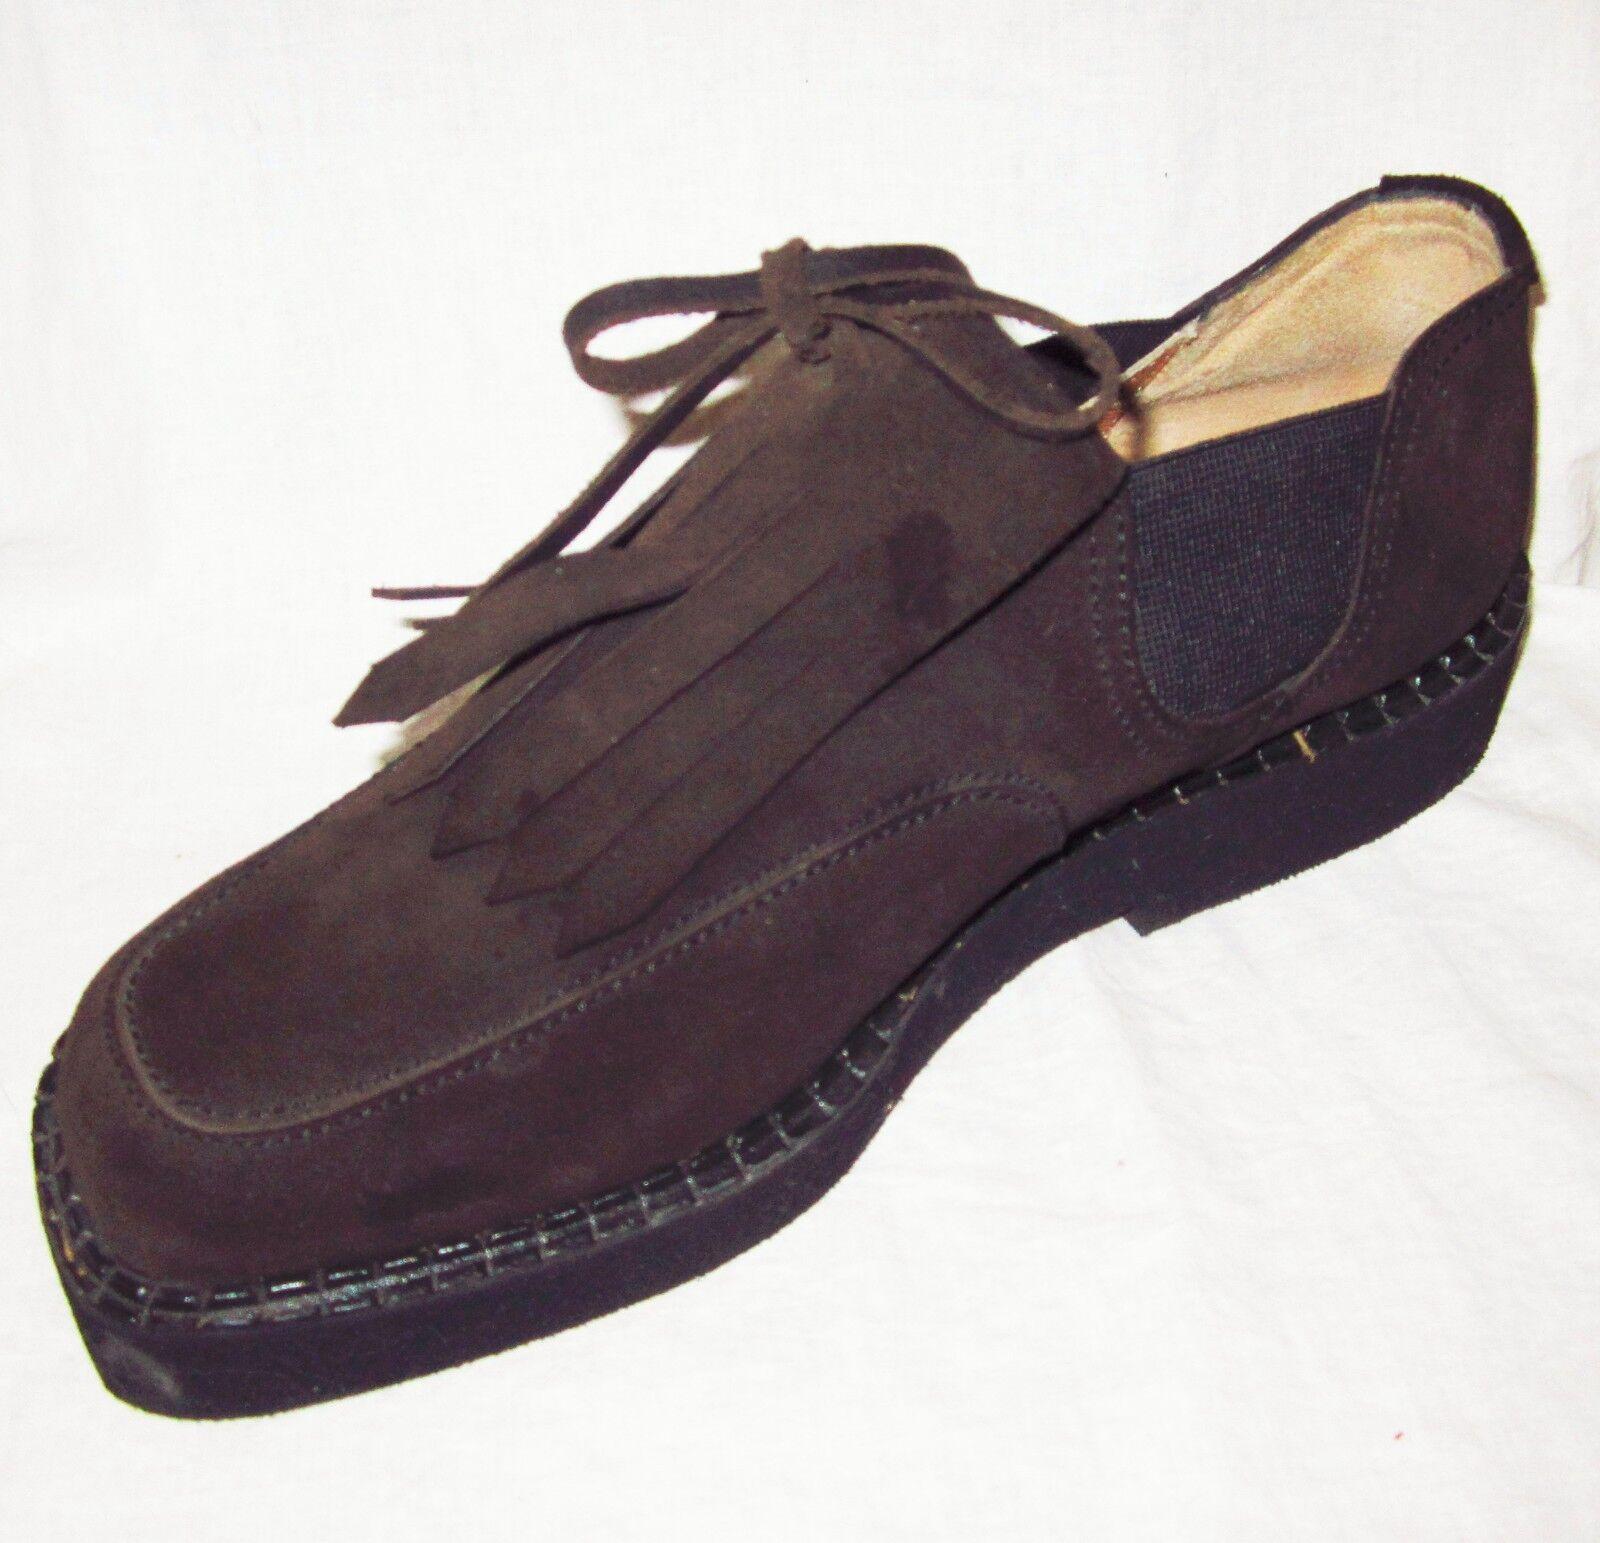 New  400 PHILIPPE MODEL Paris - Uomo Dress Shoes 9 Brown Suede Fringe SlipOn